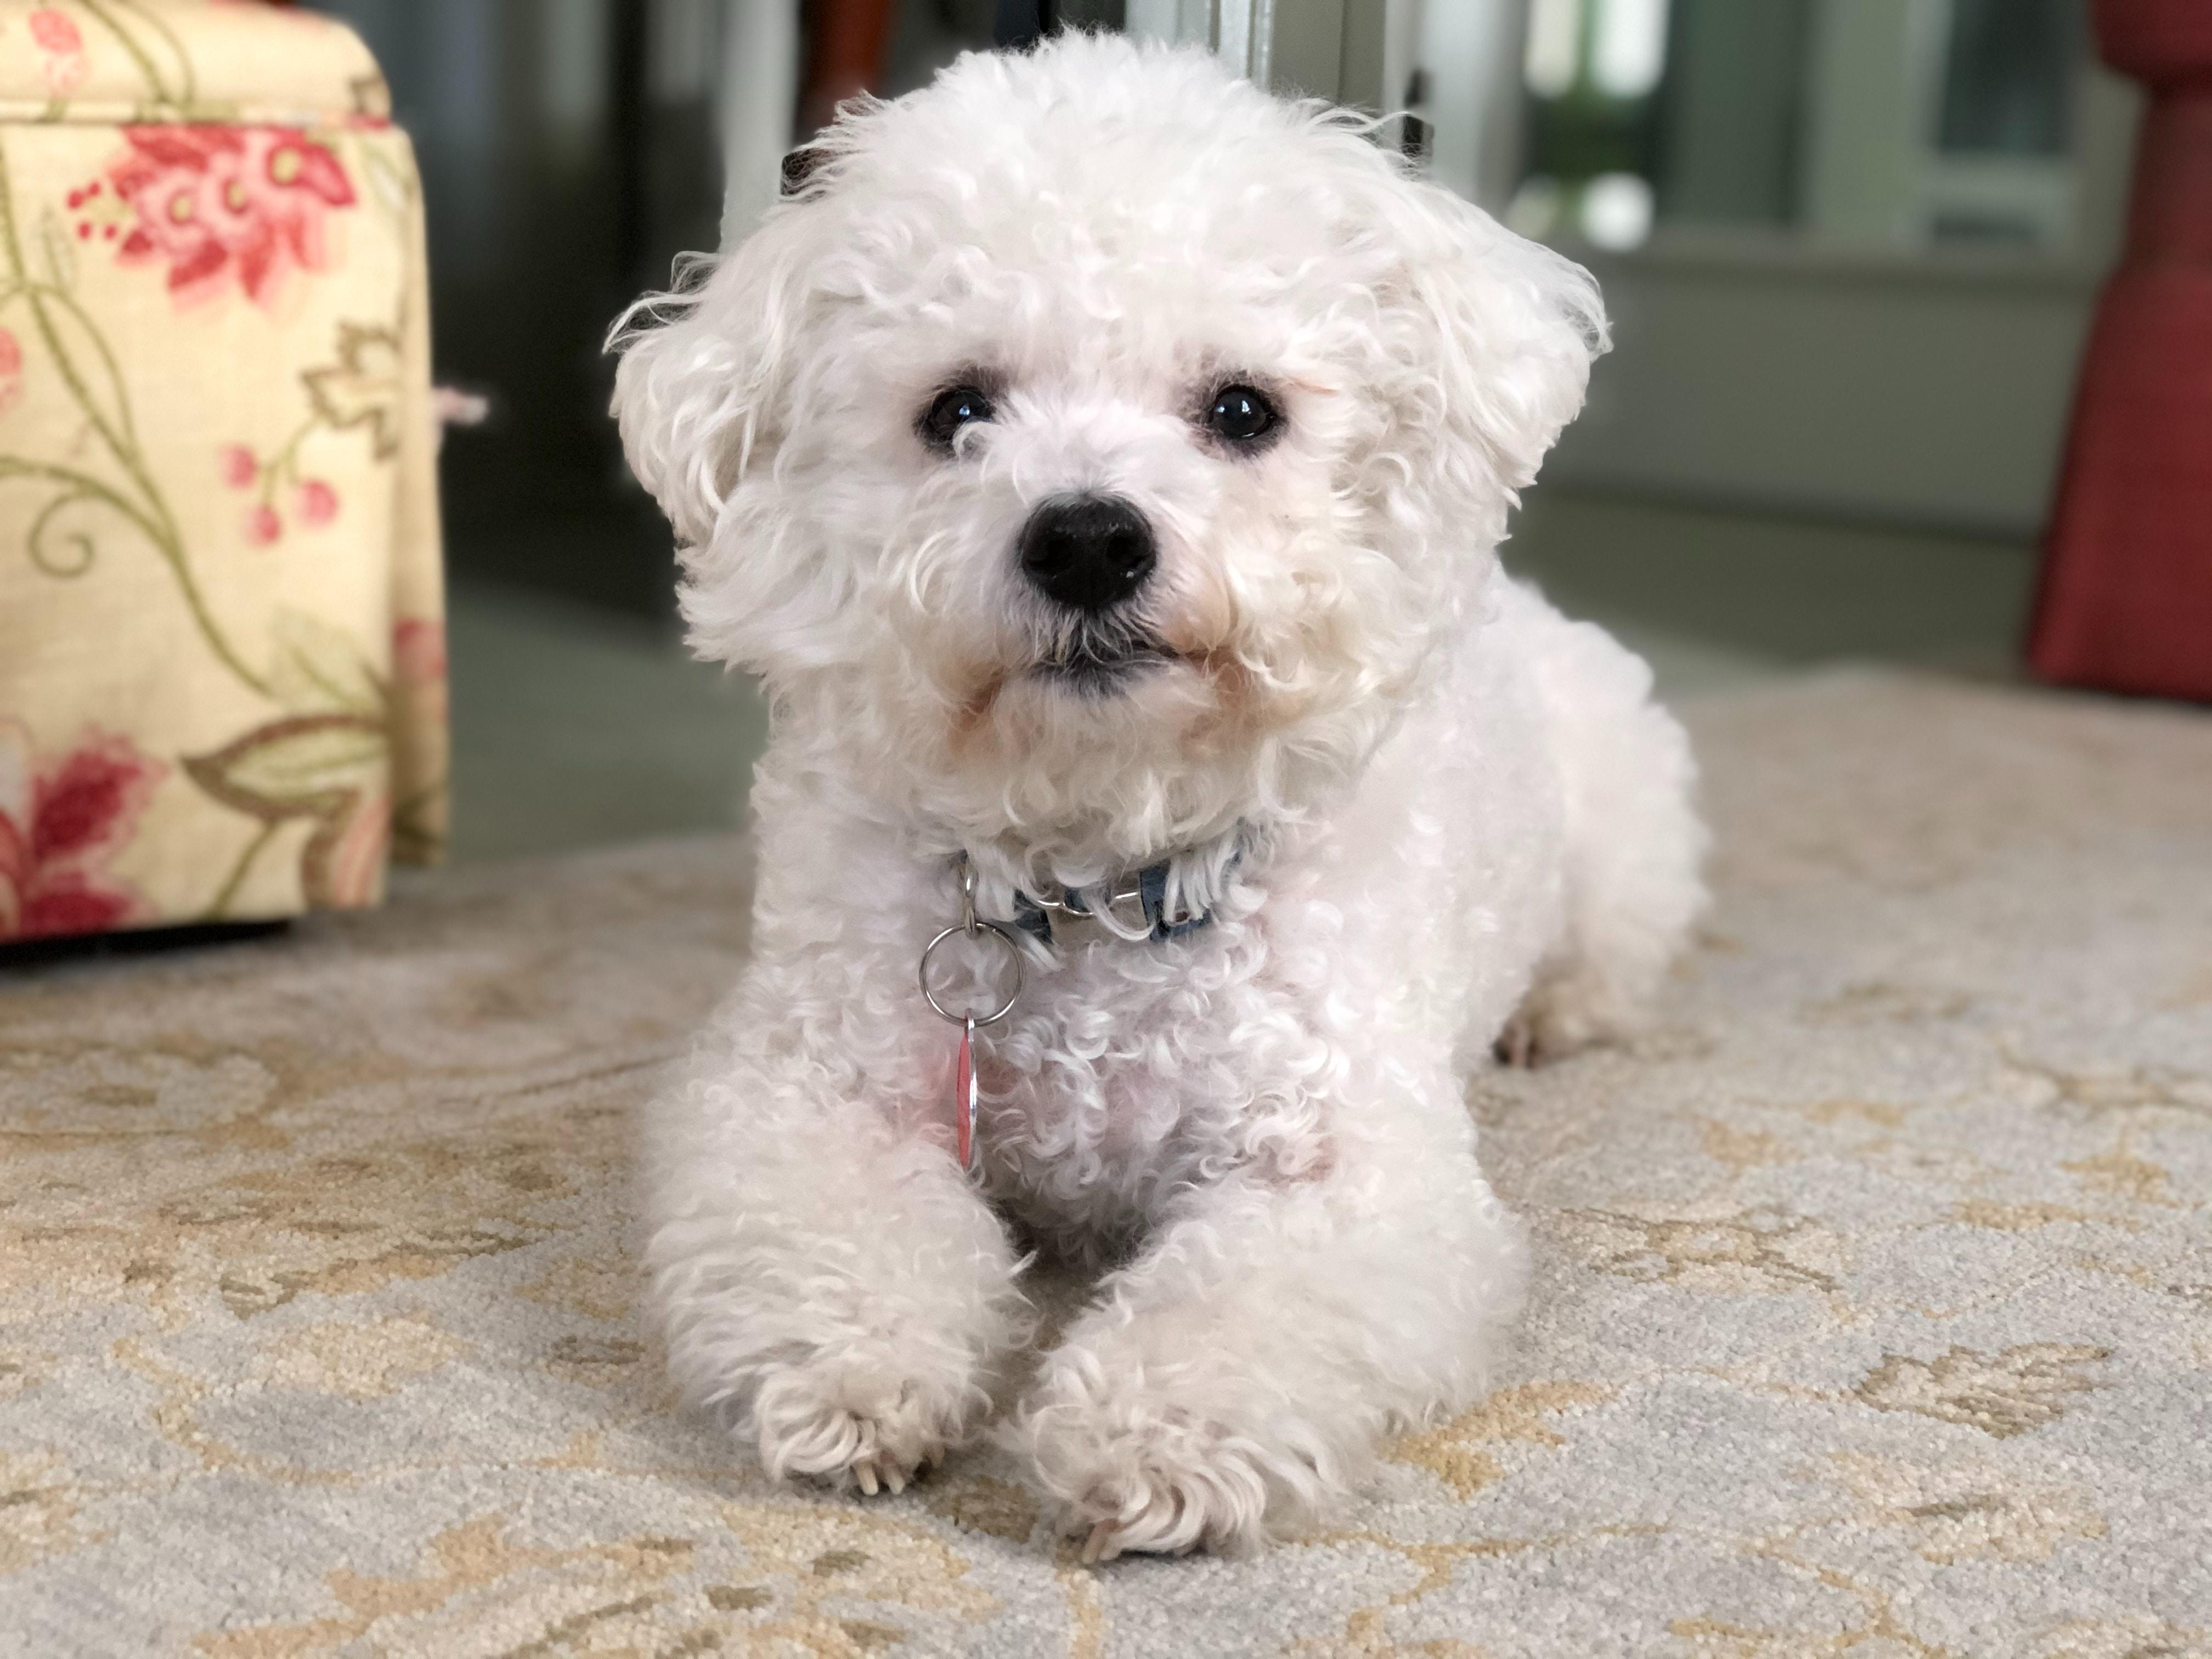 7 Great Dog Breeds for Seniors